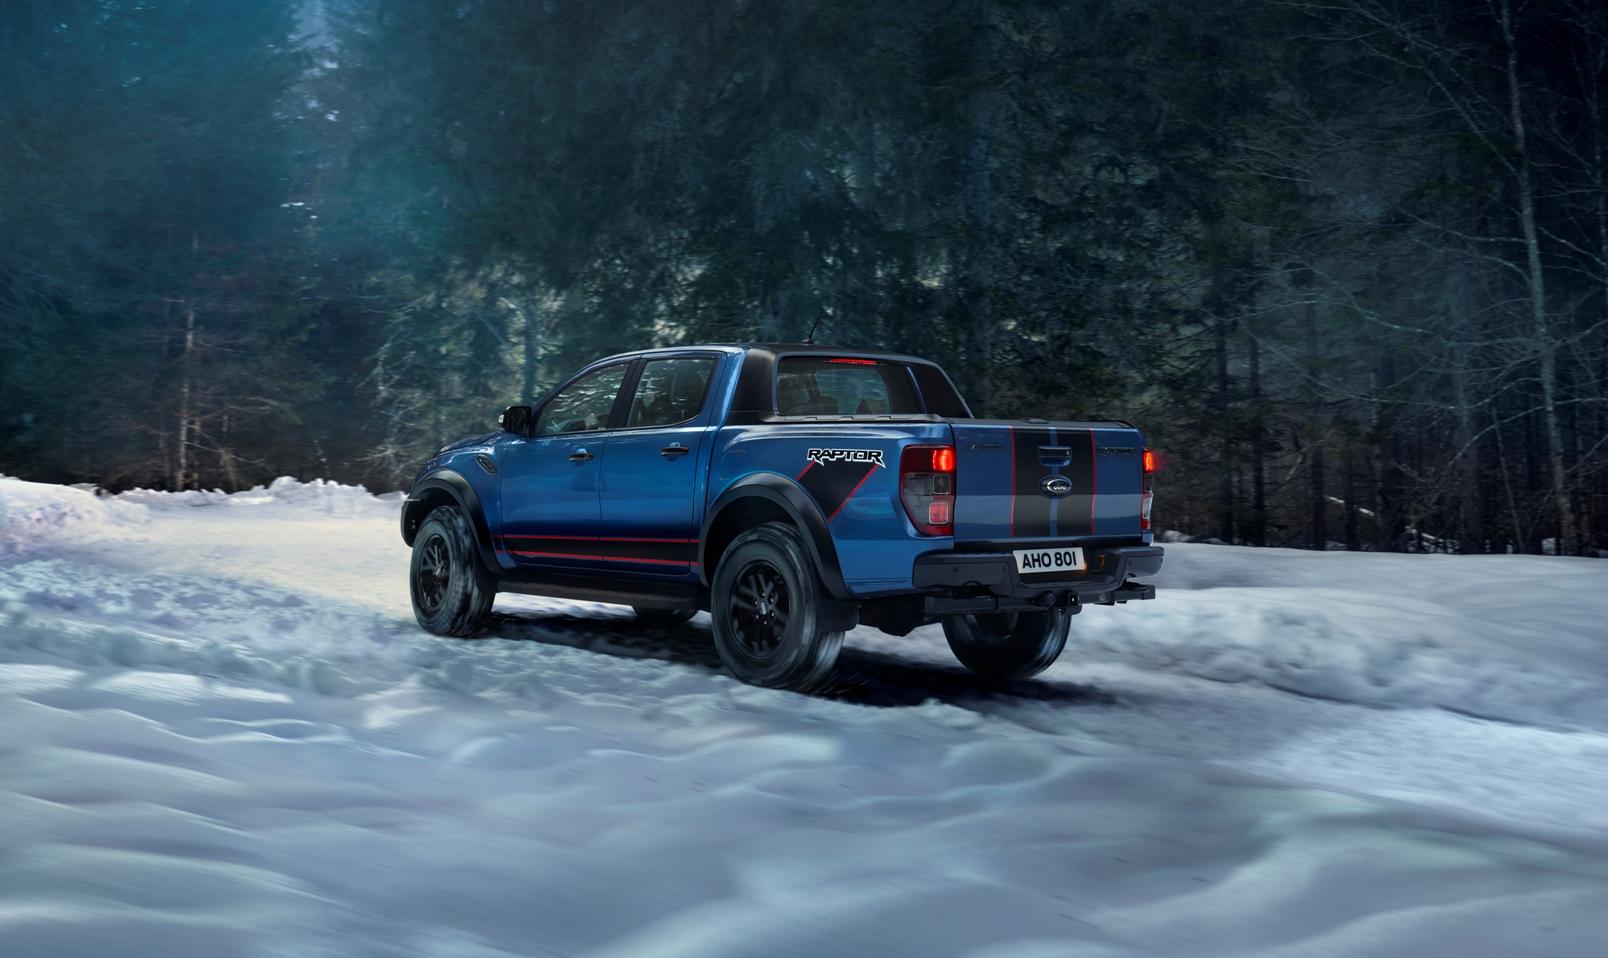 Ford Ranger Raptor Special Edition 2021 (10)